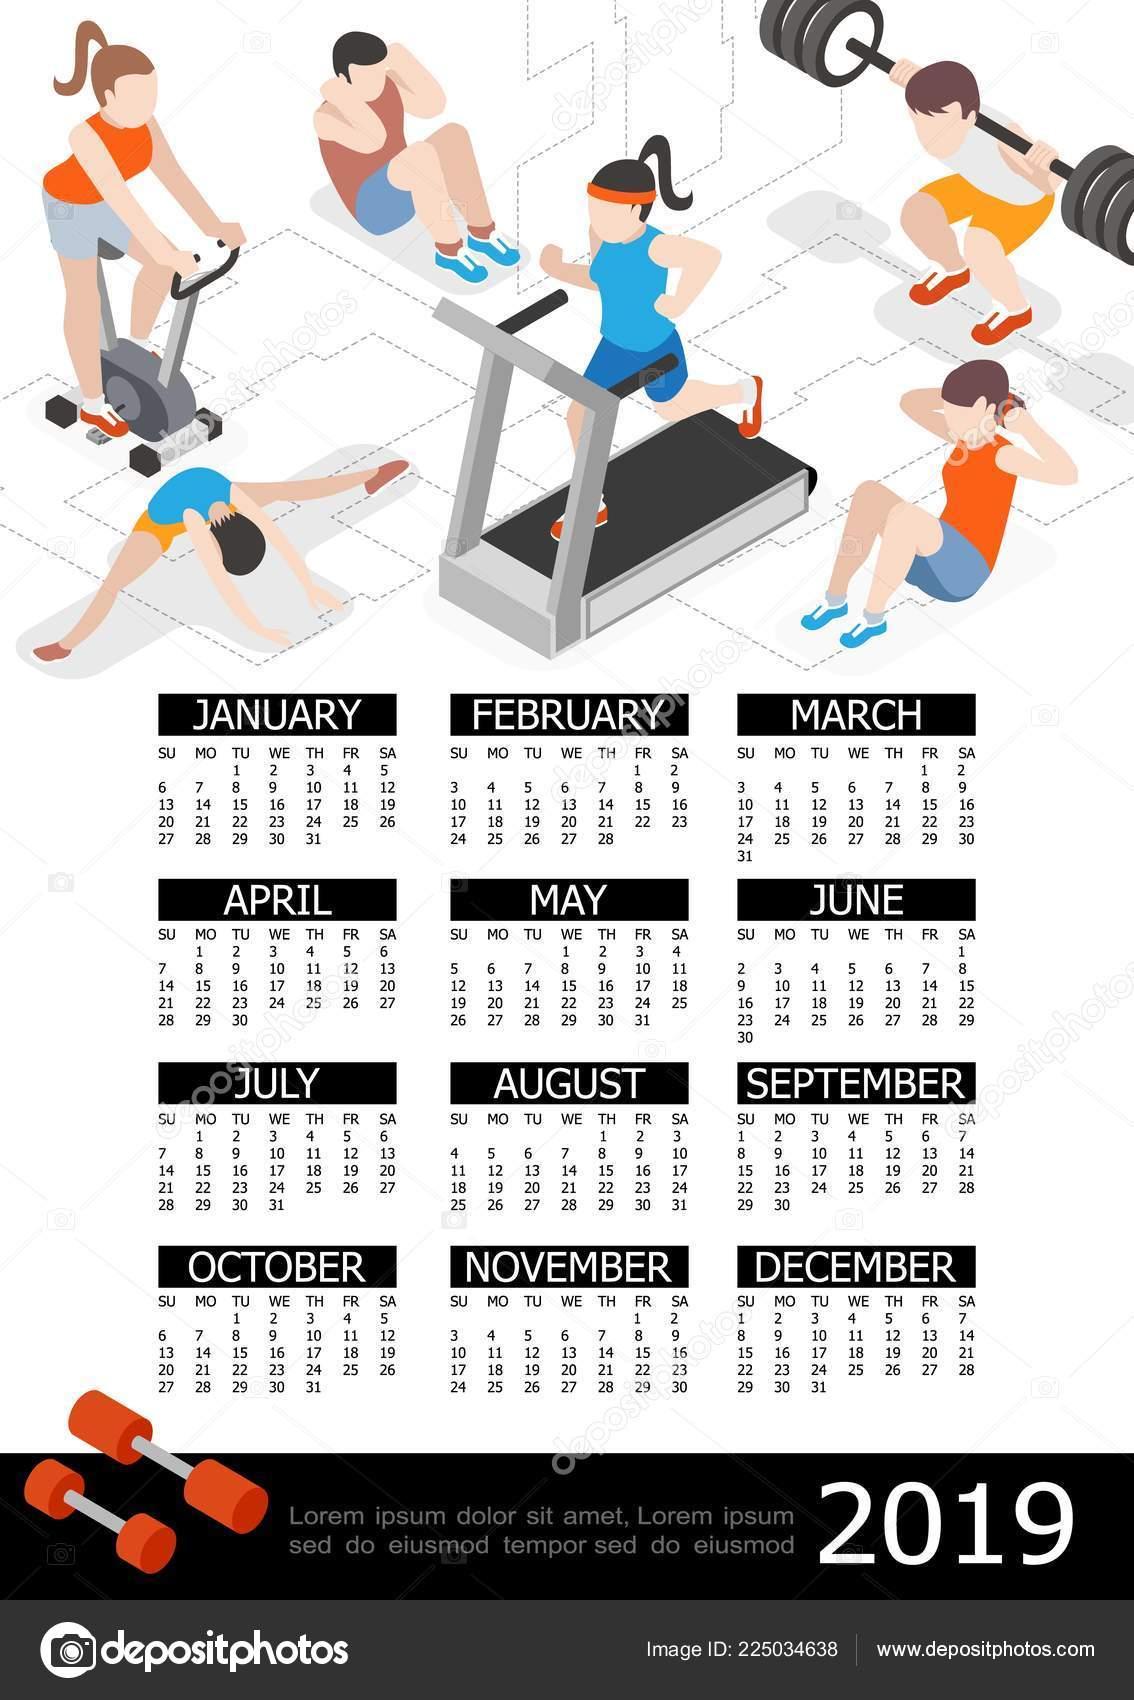 Calendario Fitness 2019.Isometric Fitness 2019 Year Calendar Template Stock Vector